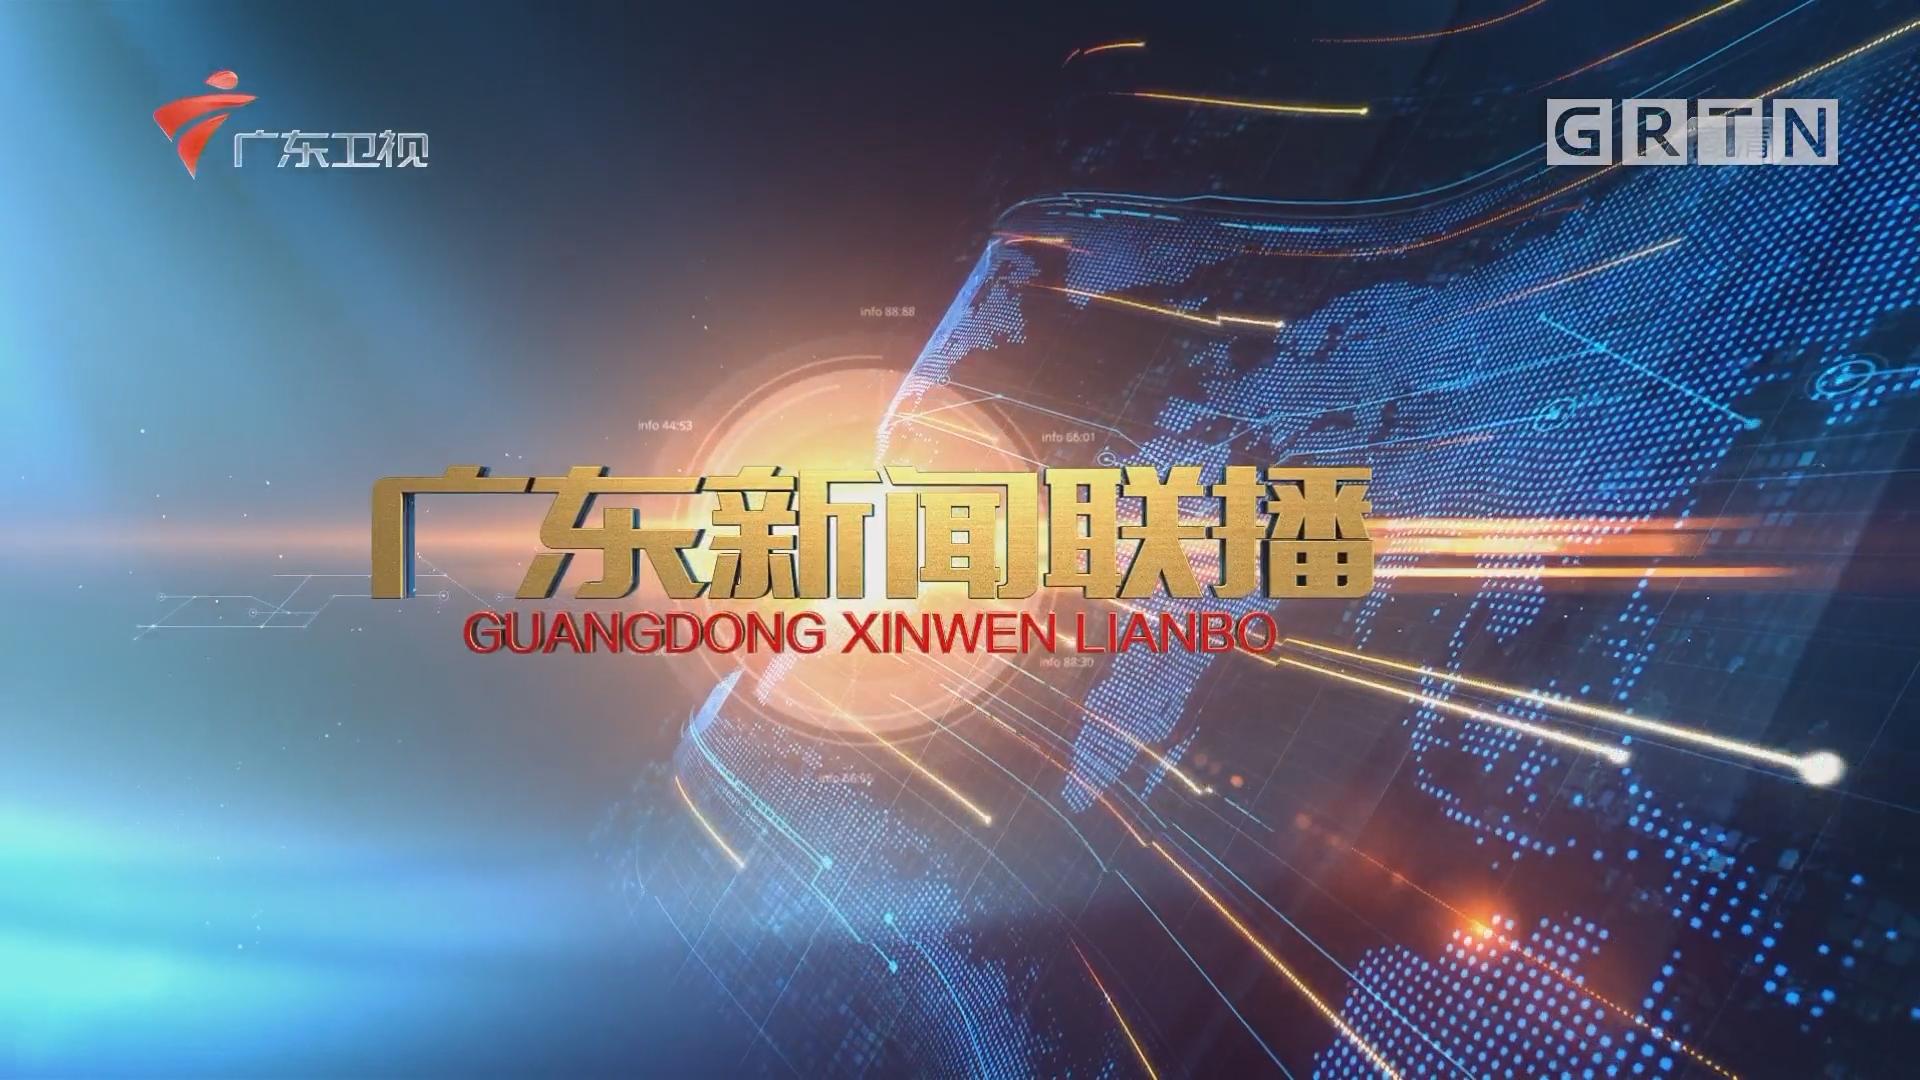 [HD][2018-02-22]广东新闻联播:新华社:谱写新时代改革新篇章